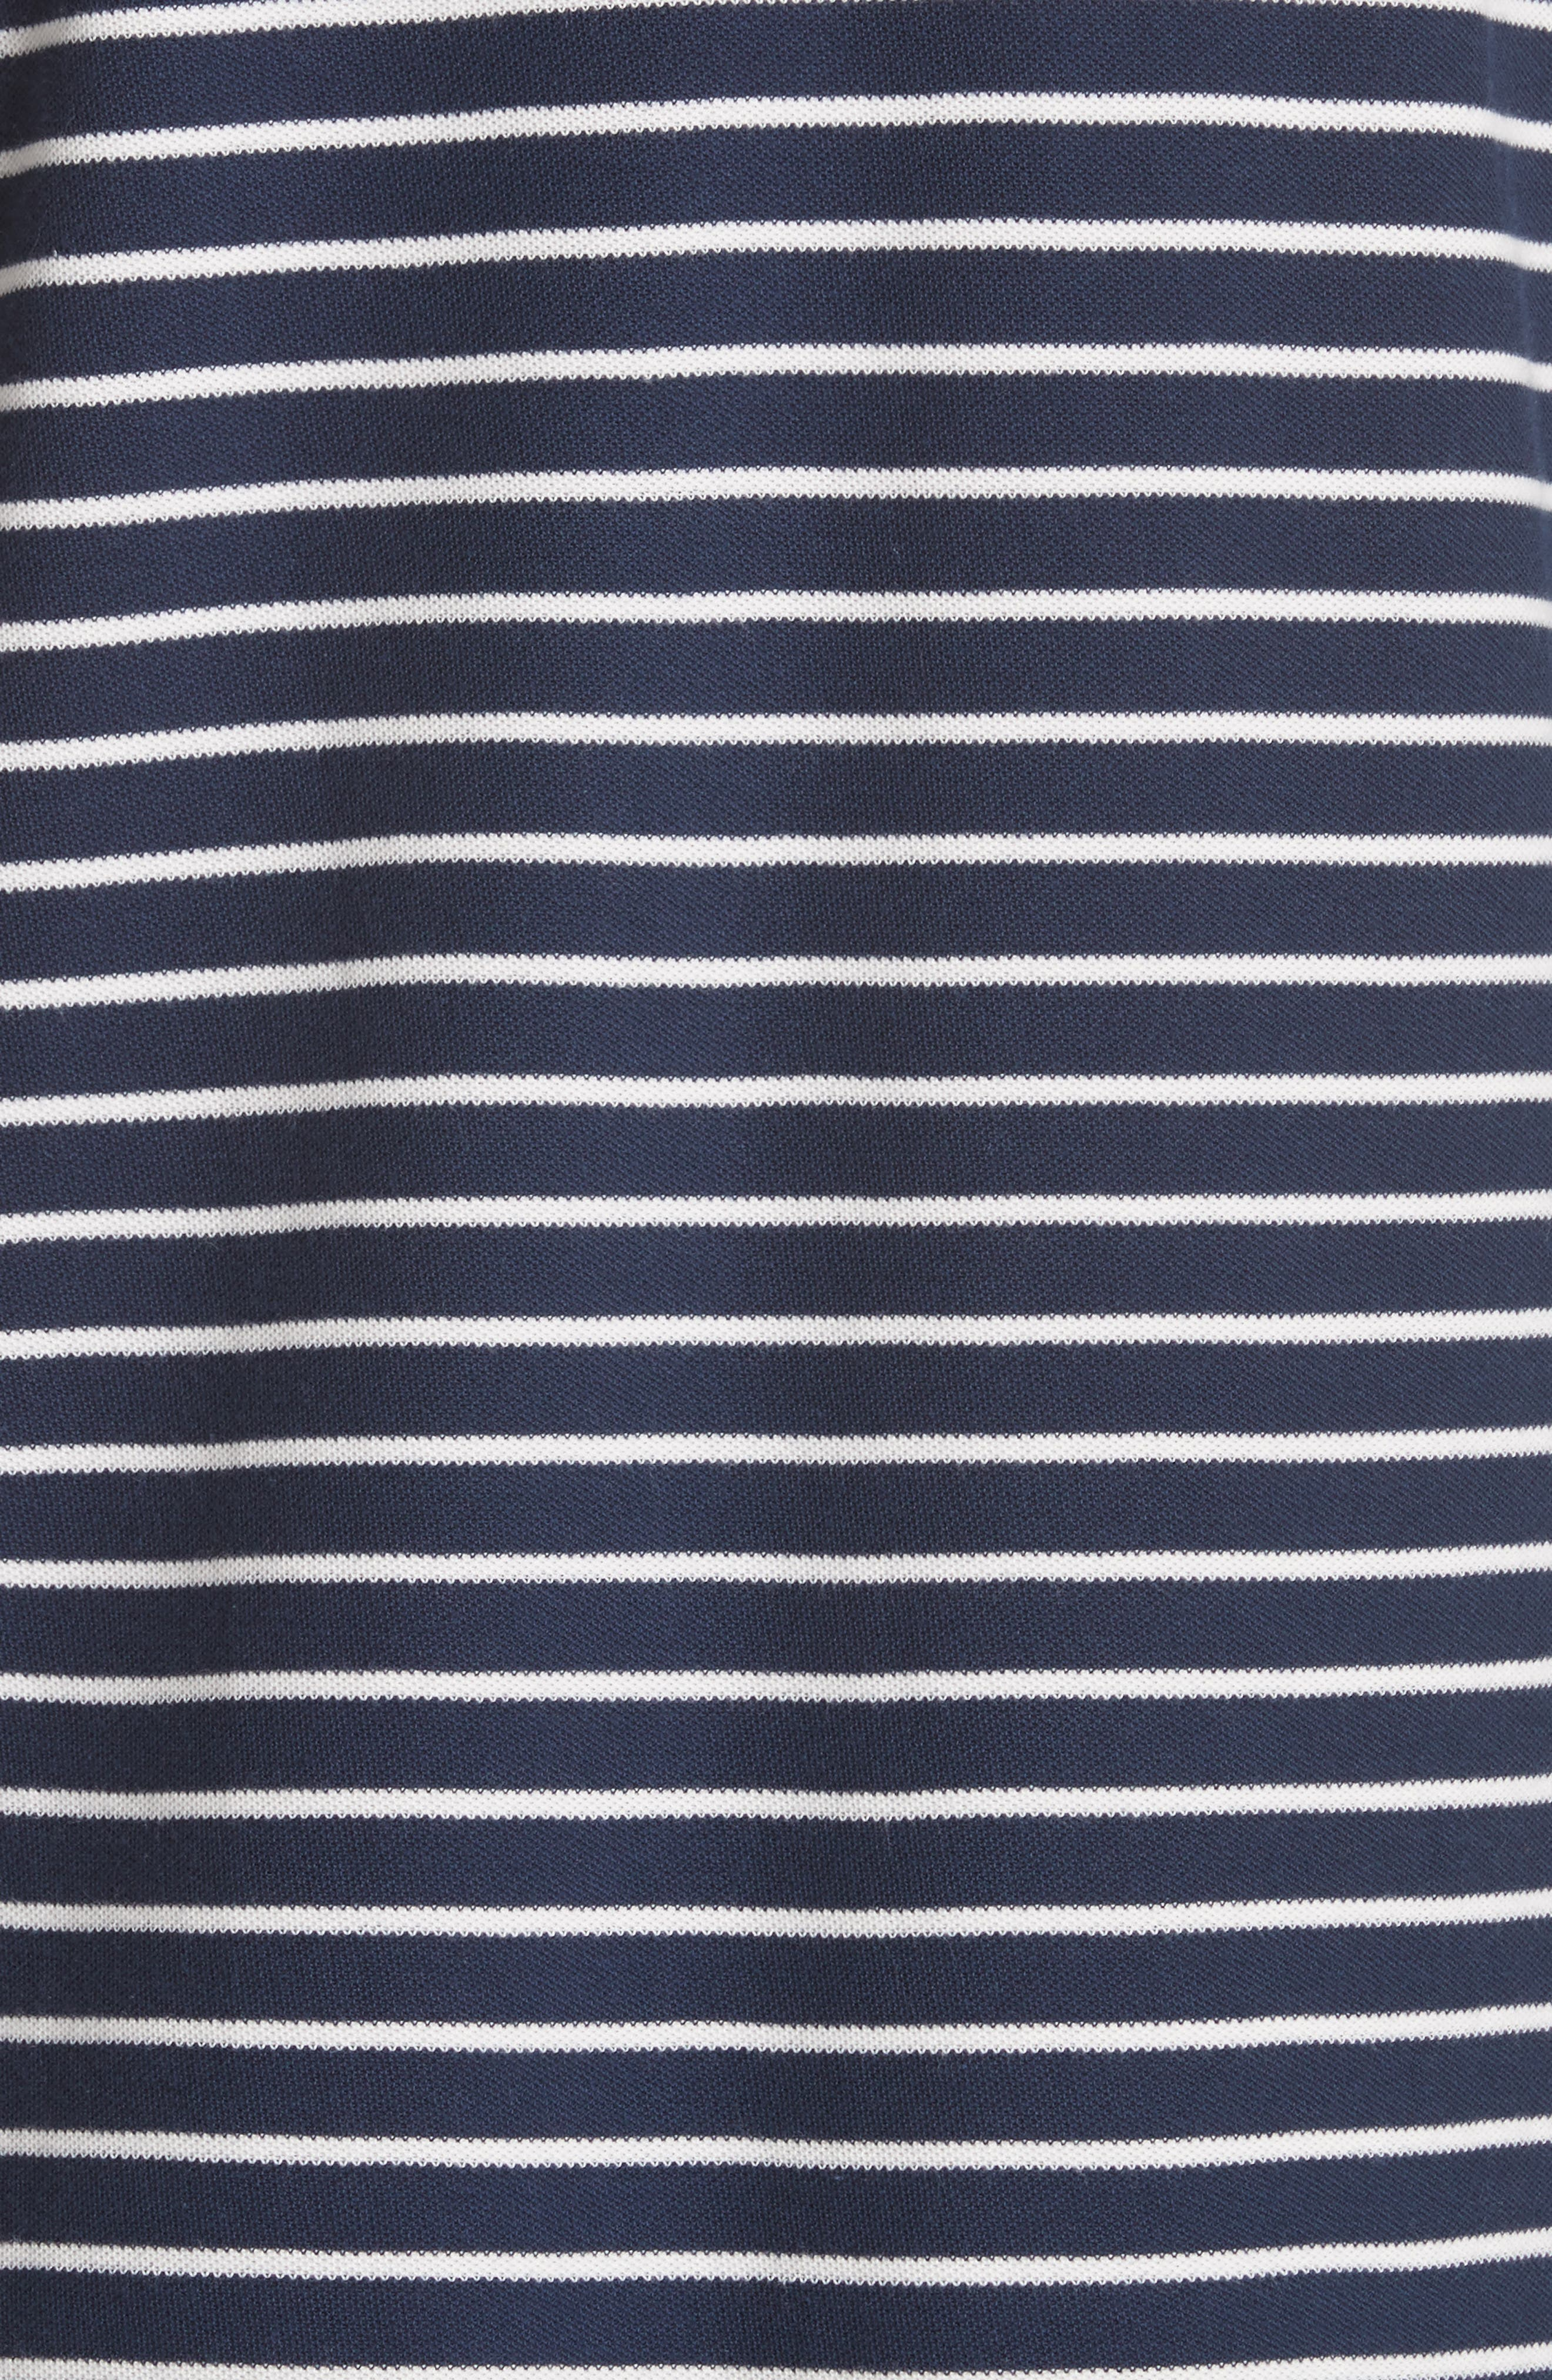 Stripe Shift Dress,                             Alternate thumbnail 5, color,                             Navy/ Chalk Stripe